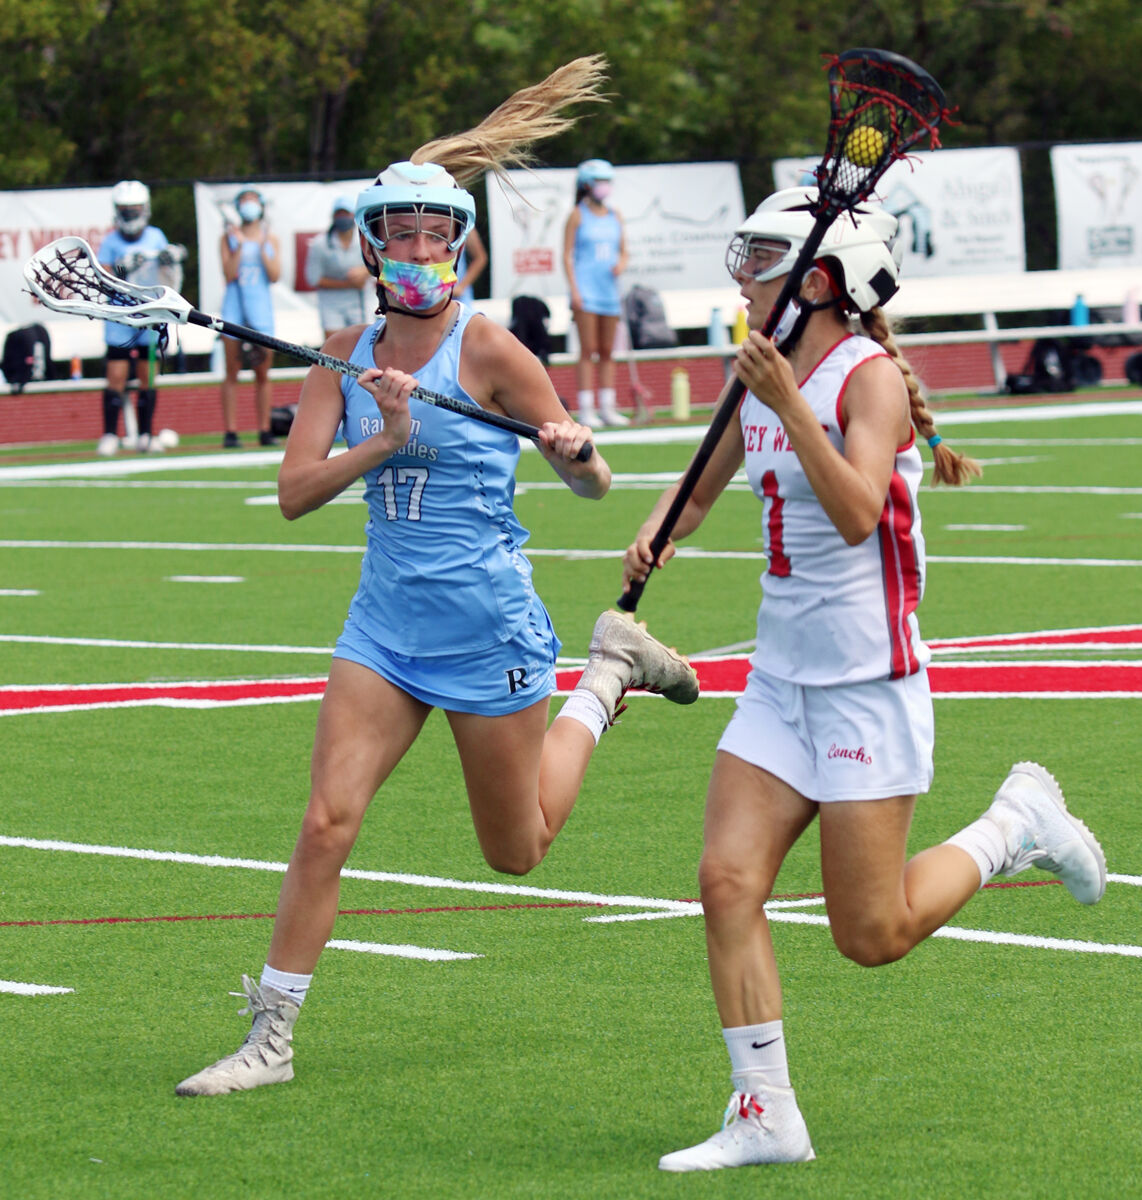 2021.04.07 prep girls lacrosse marchiano with ball.jpg